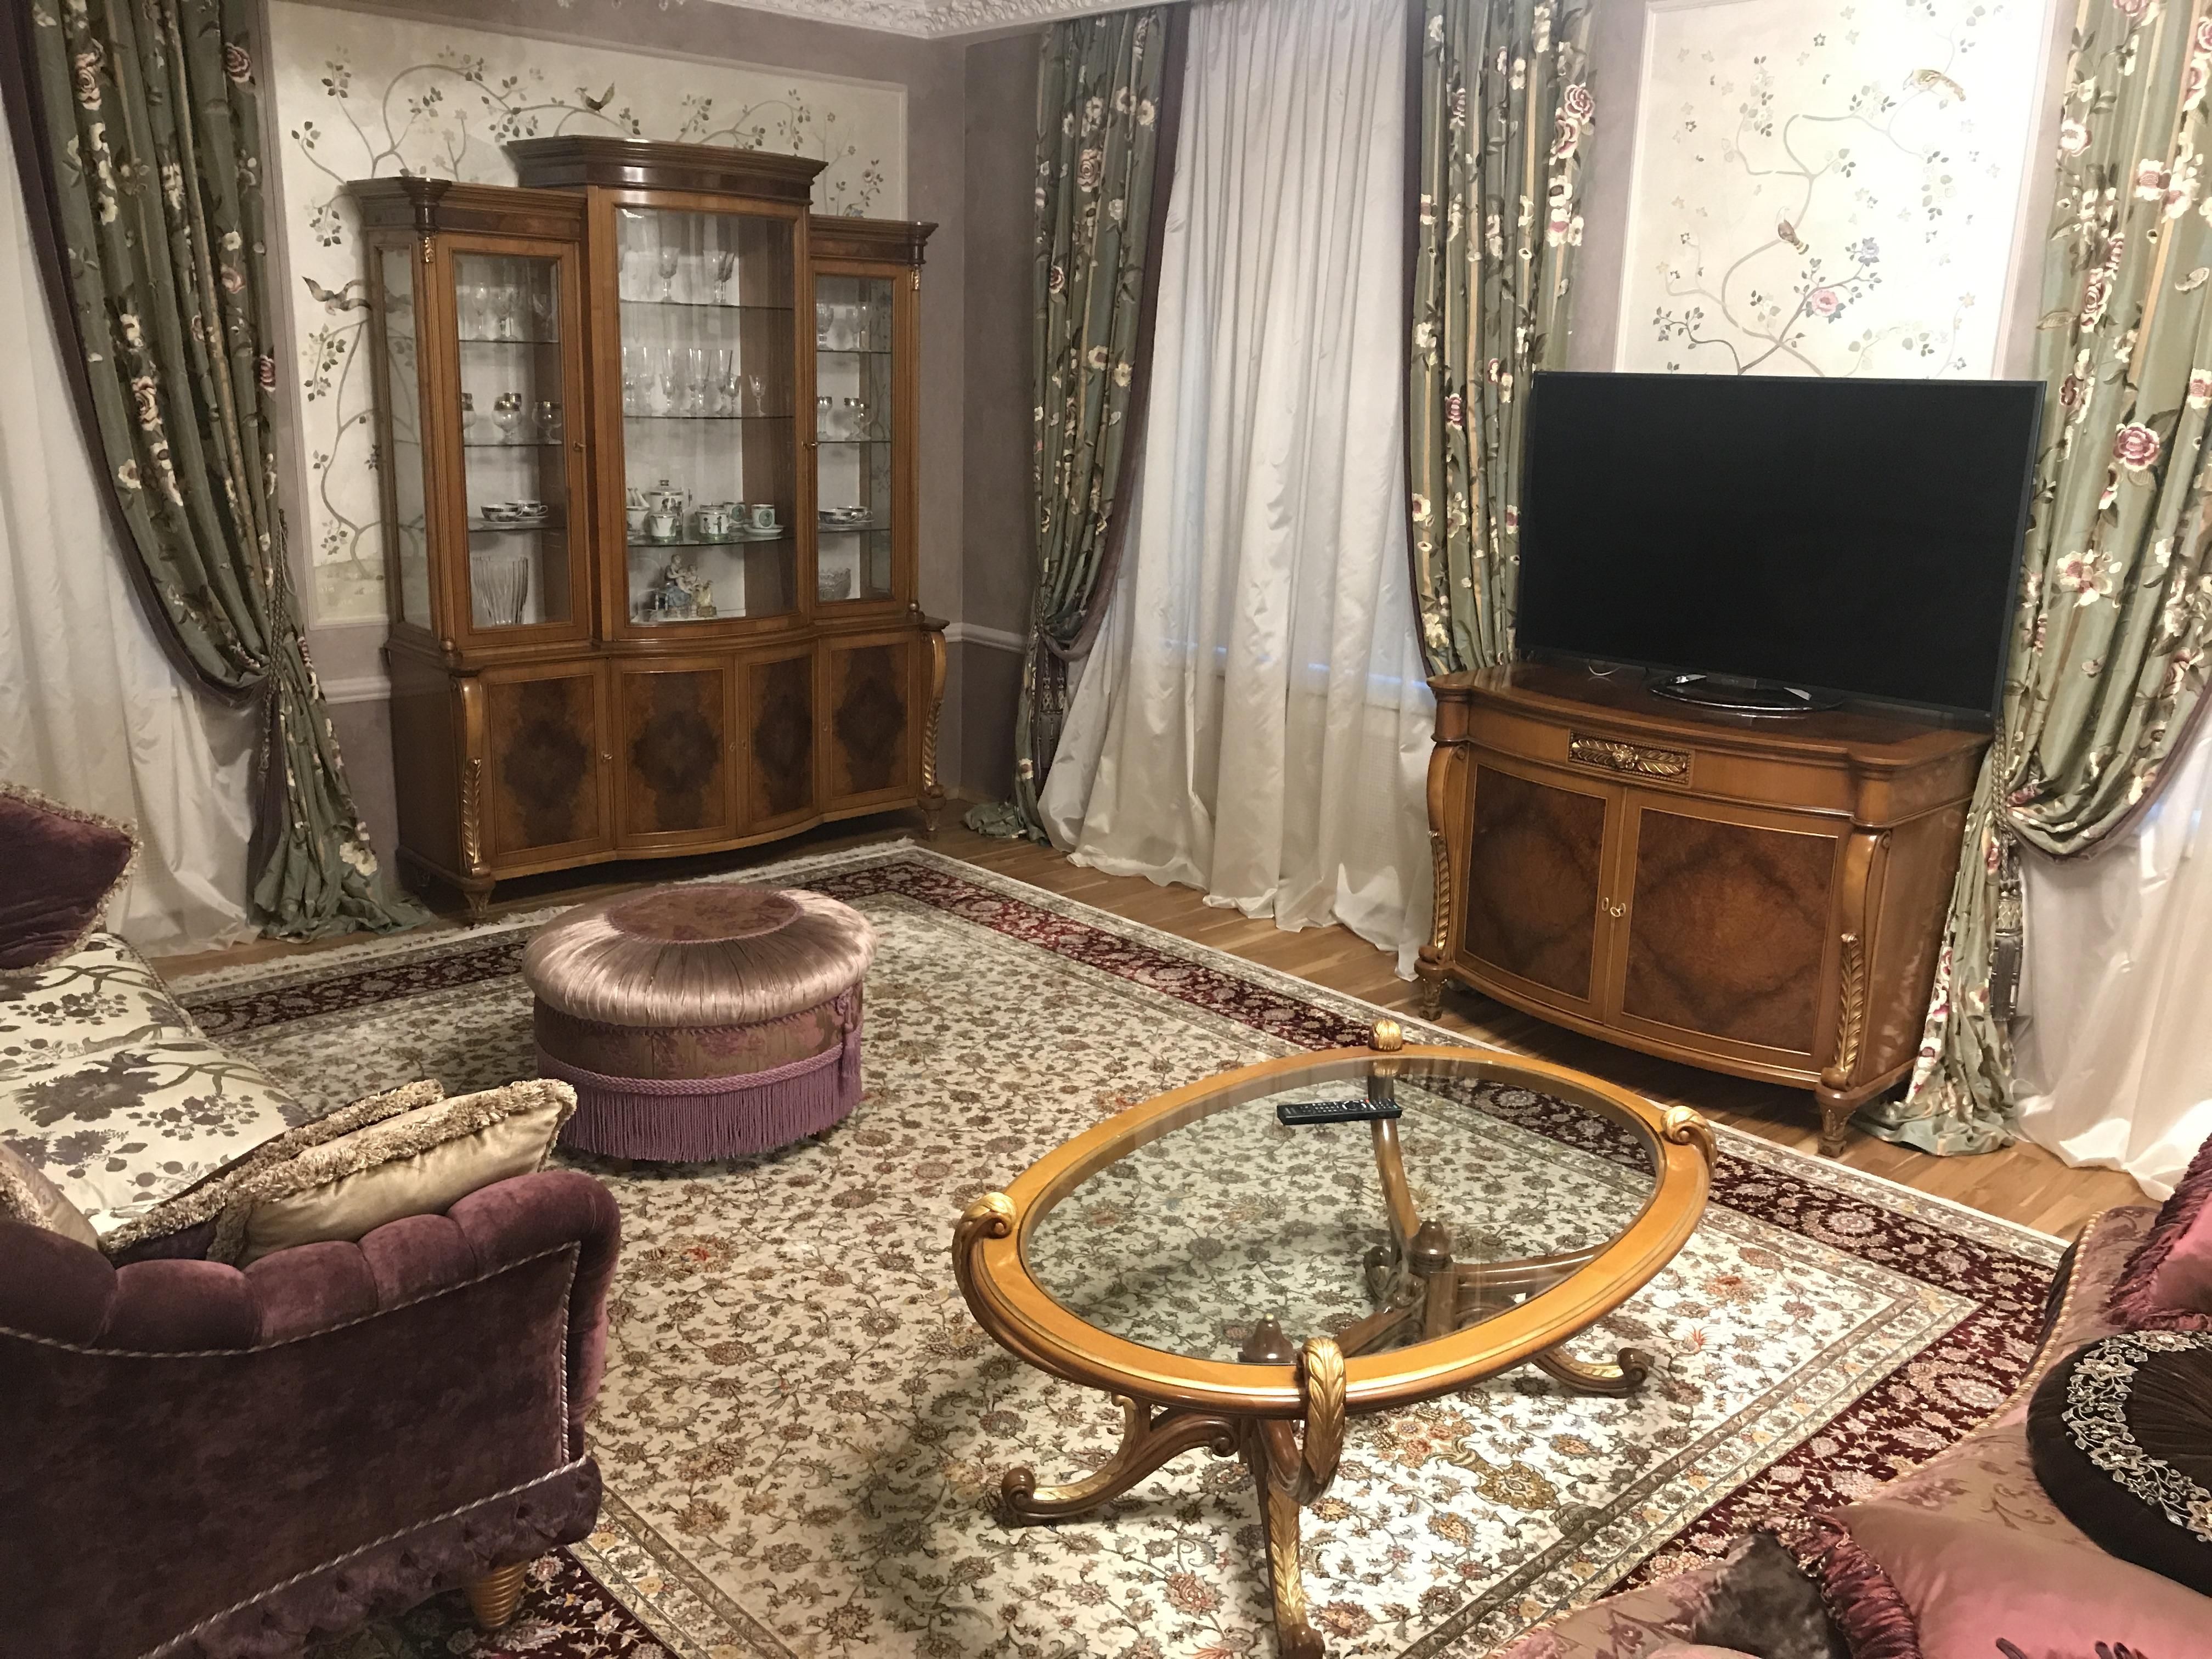 Охрана 3-комнатной квартиры в Санкт-Петербурге без видеокамер - ЭГО-Система